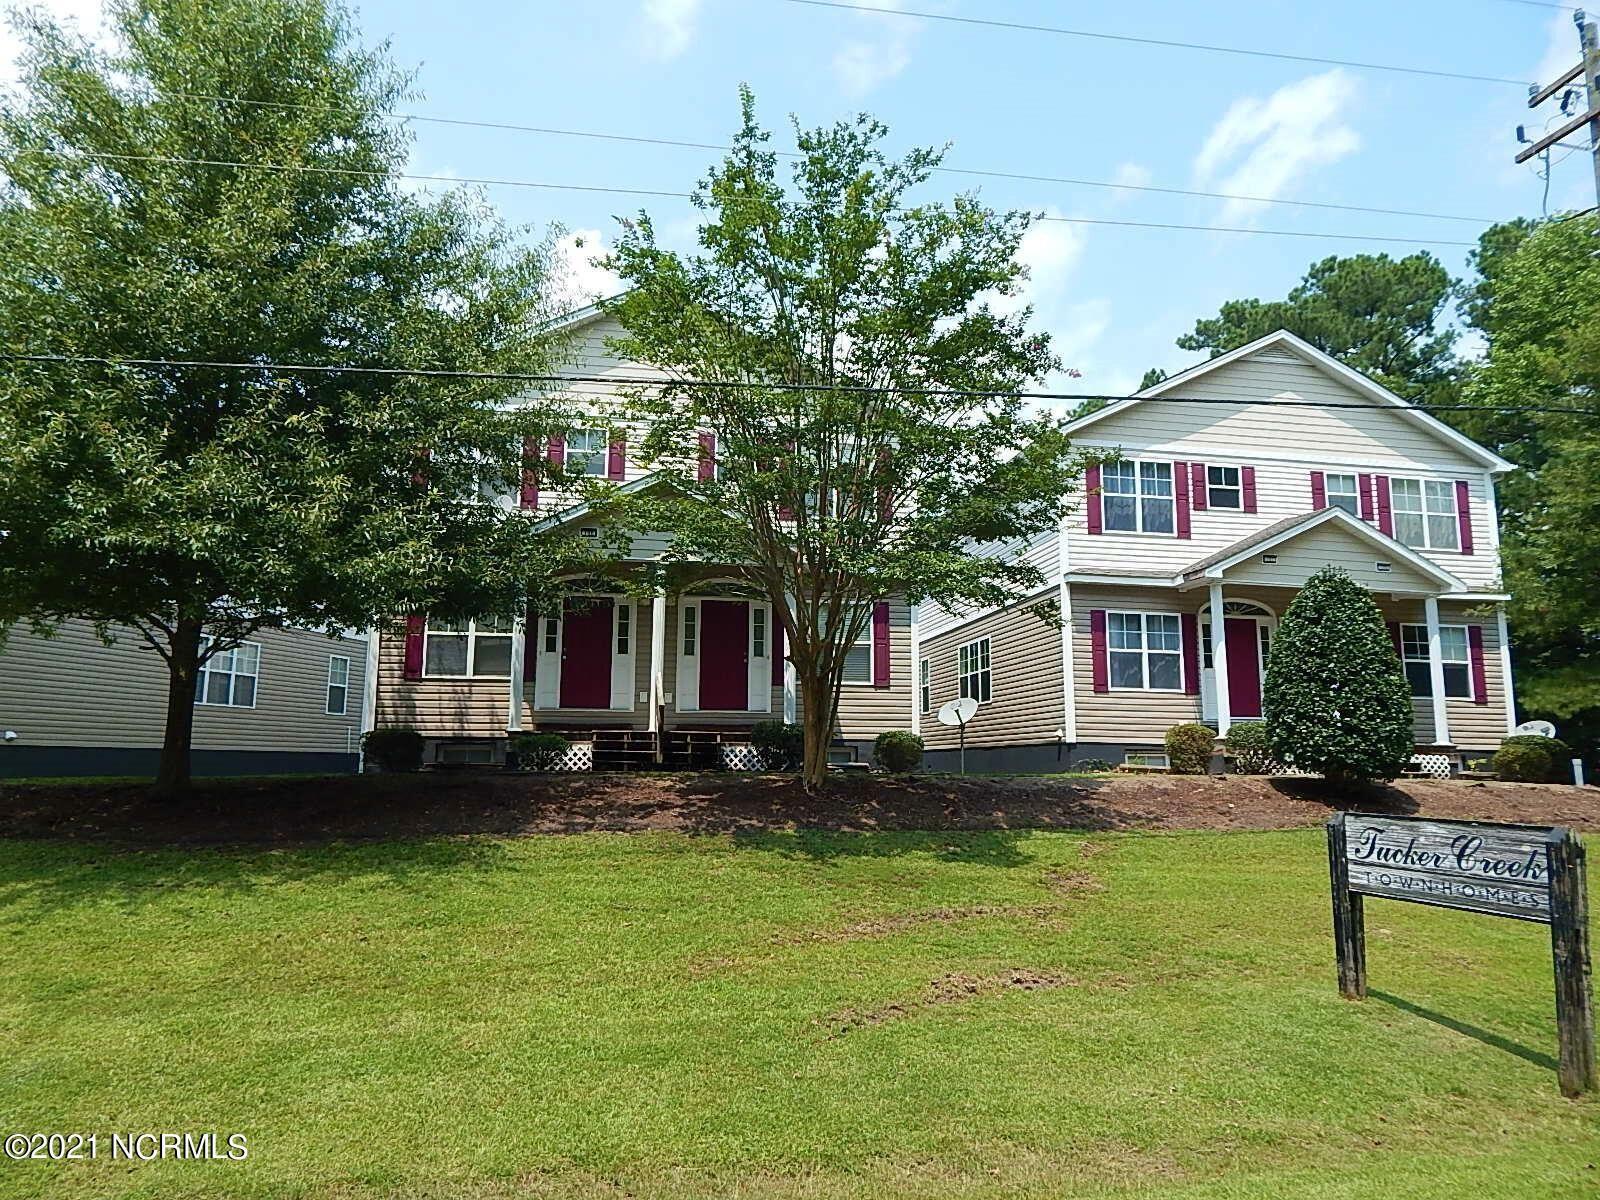 Photo of 500 Sea Knight Lane, Havelock, NC 28532 (MLS # 100290684)